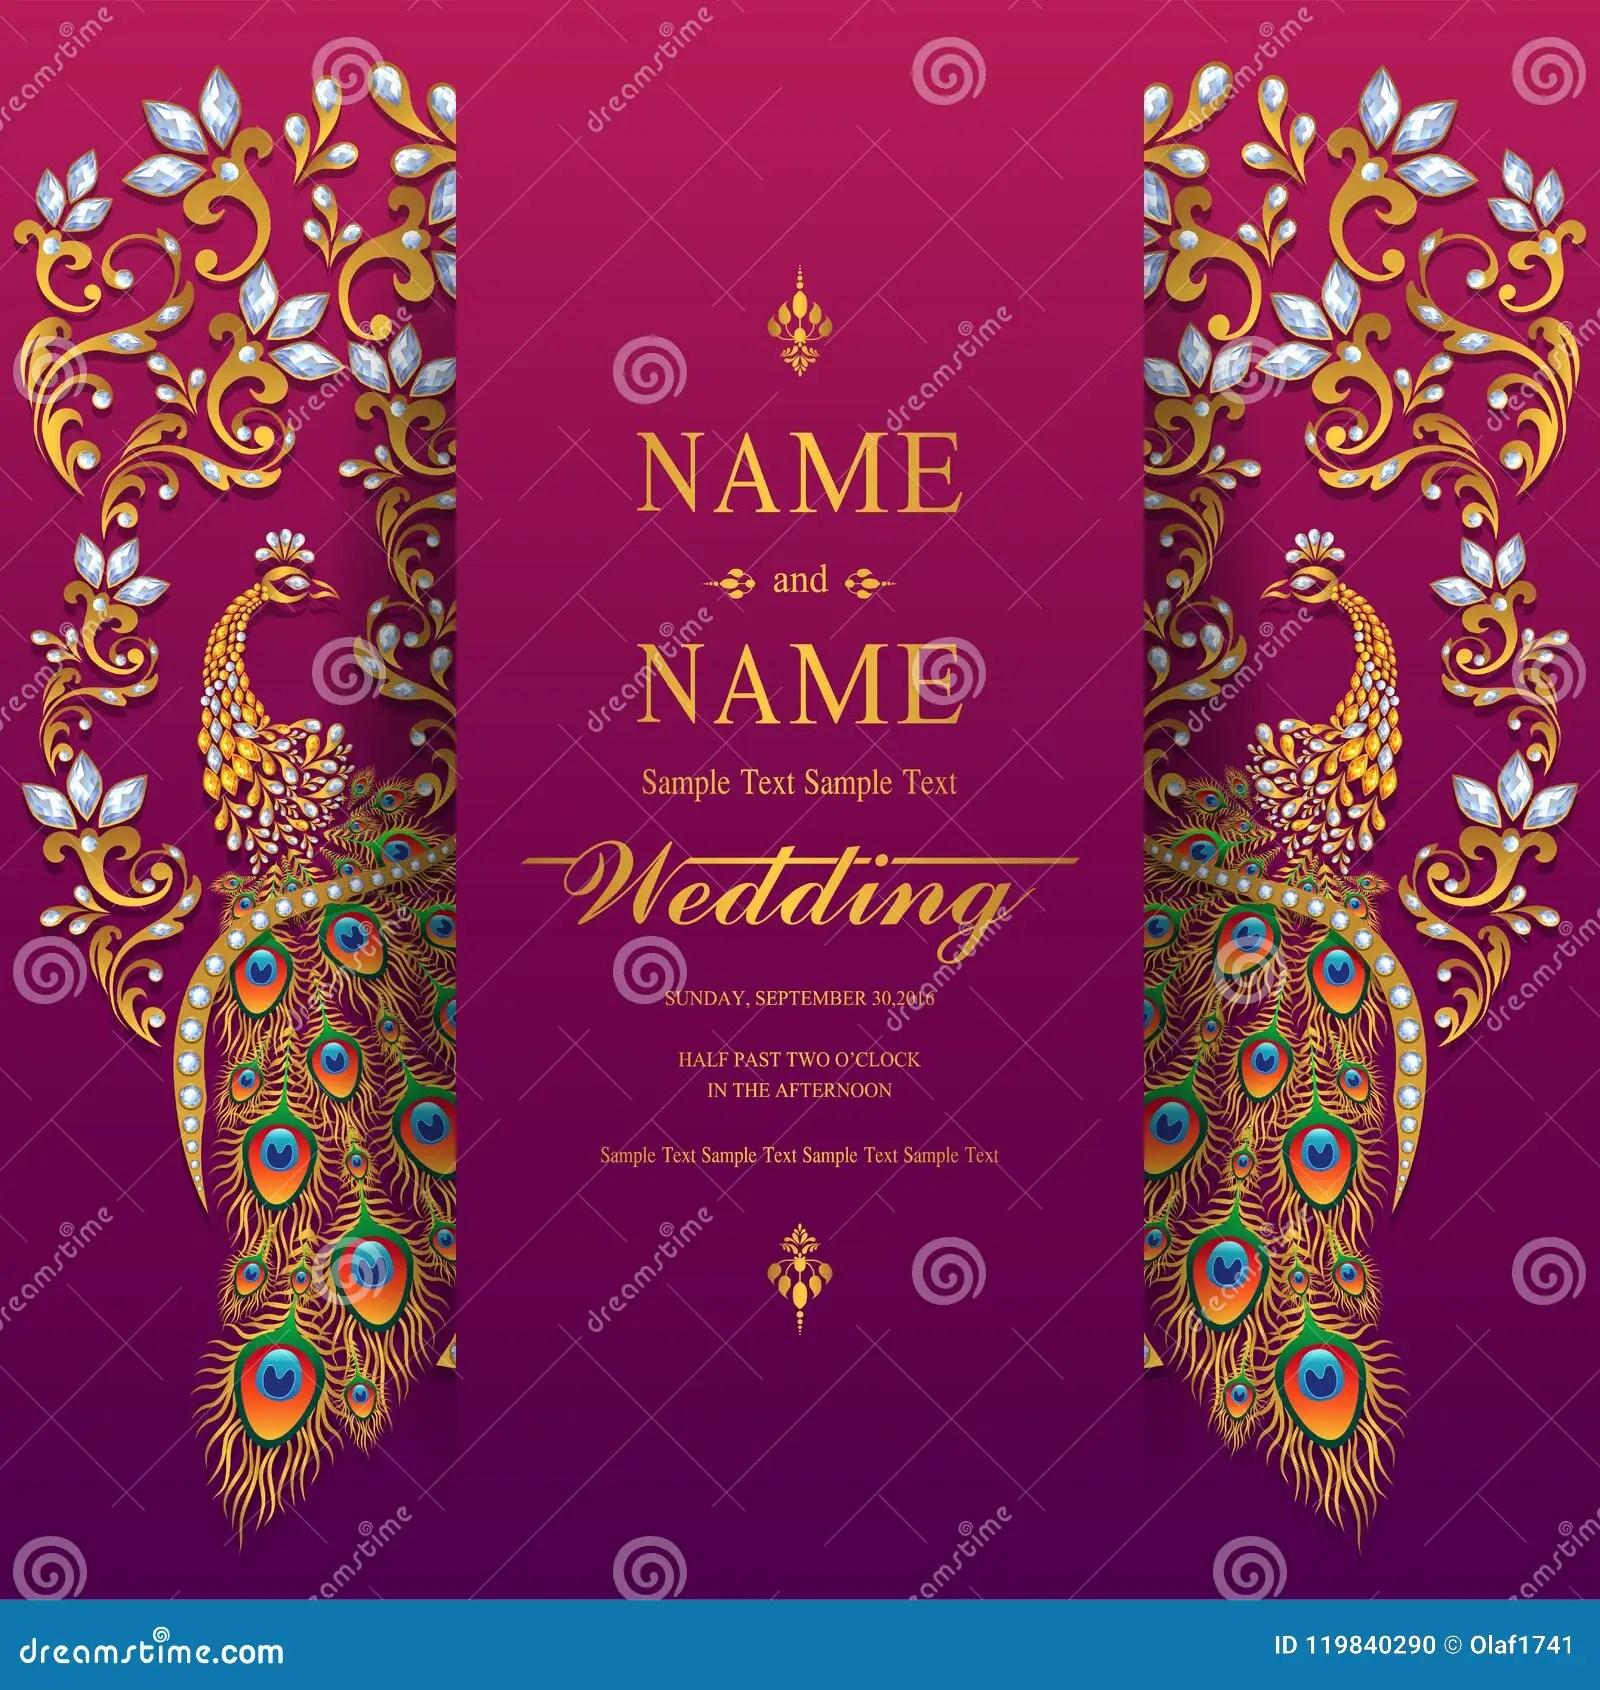 https www dreamstime com wedding invitation card templates indian gold patterned crystals paper color background image119840290